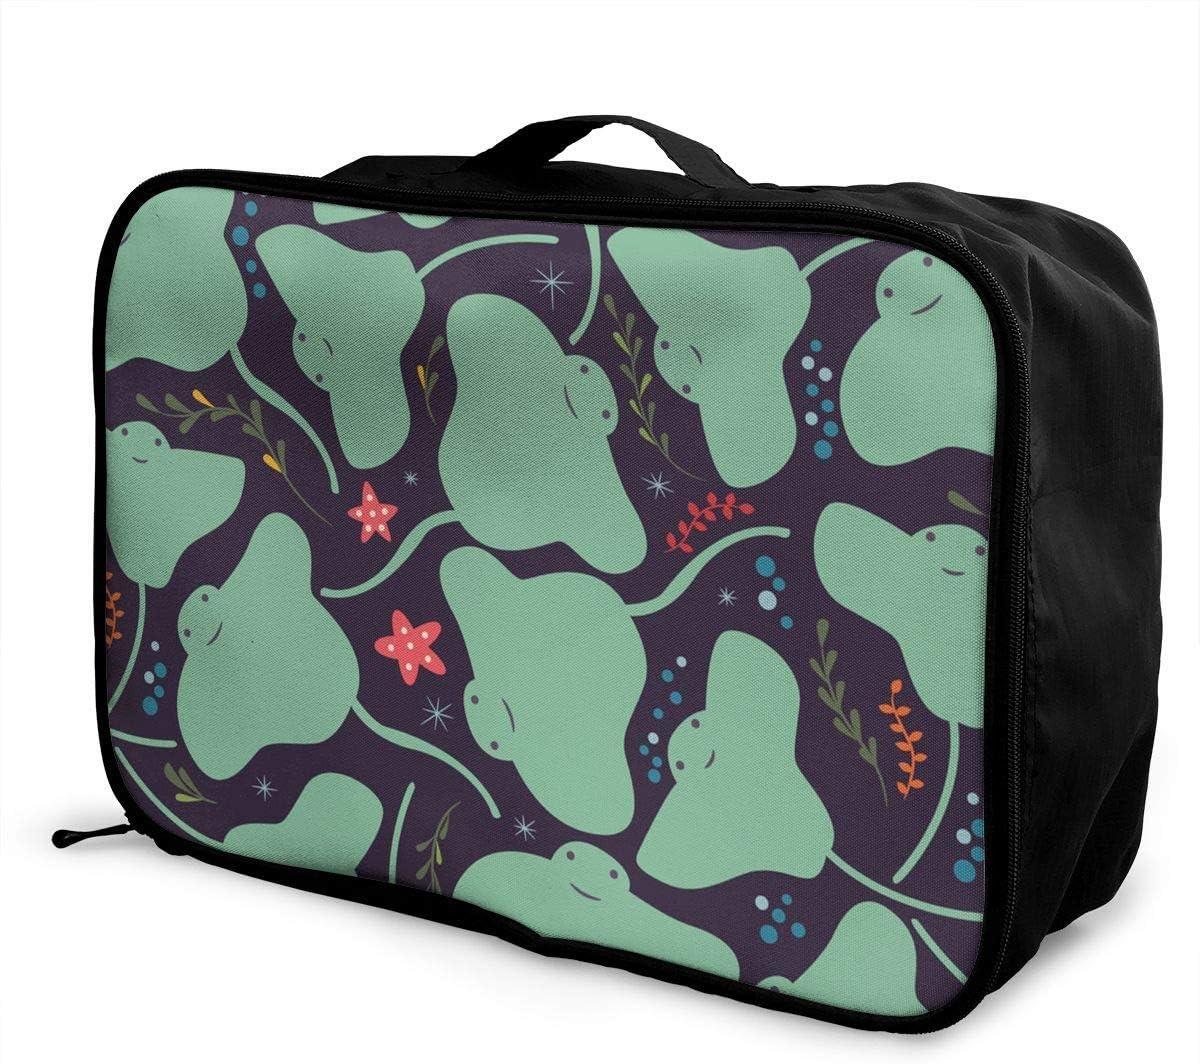 Qurbet Bolsas de Viaje, Travel Lightweight Waterproof Foldable Storage Carry Luggage Duffle Tote Bag - Kawaii Sting Ray